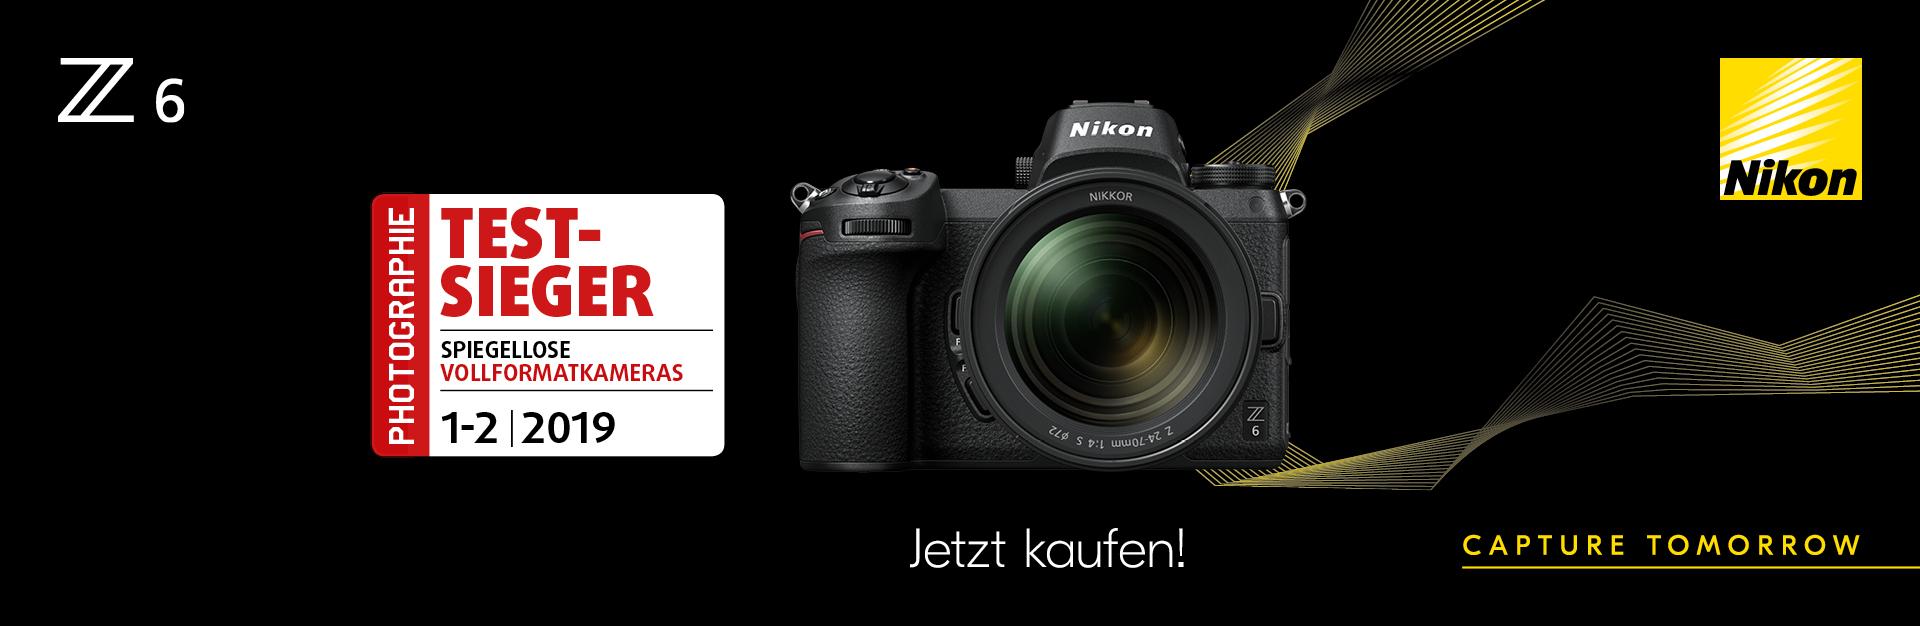 Nikon Z6 Kit 24-70/4,0 S + Objektivadapter+XQD 64GB